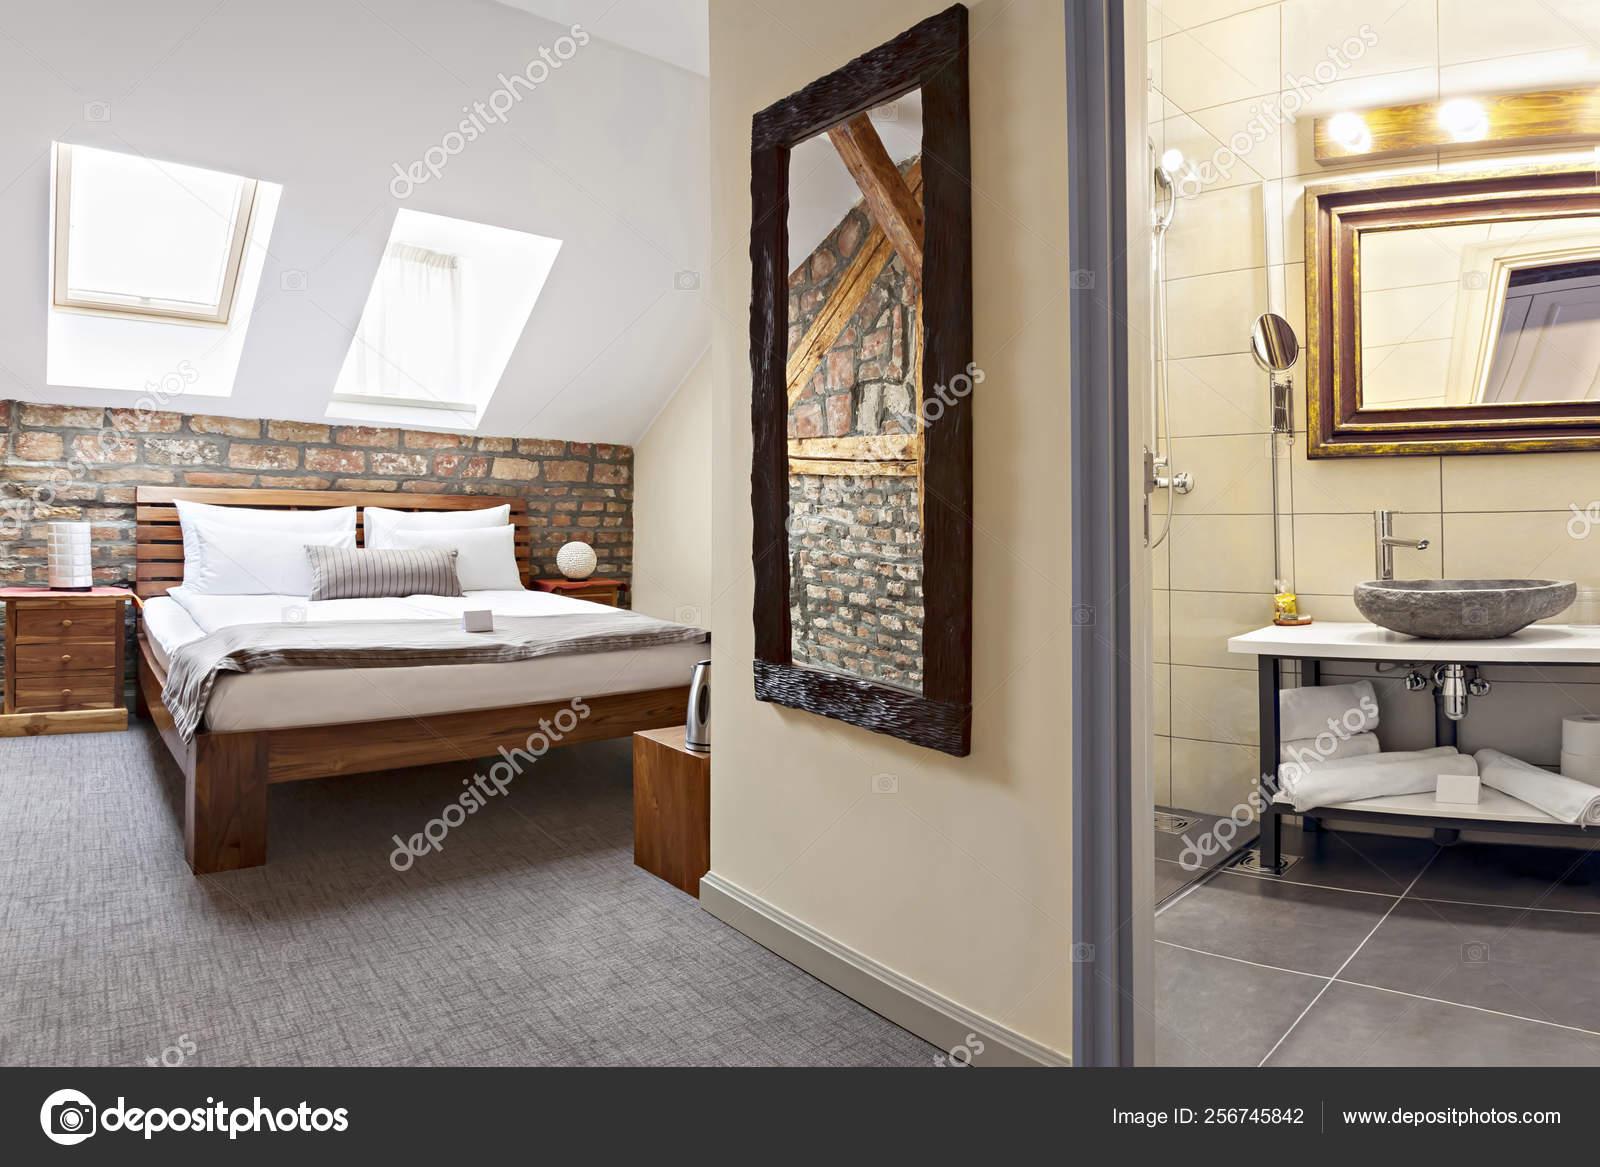 Luxurious Modern Loft Bedroom Interior With Twin Bed Stock Photo C Miriristic Gmail Com 256745842